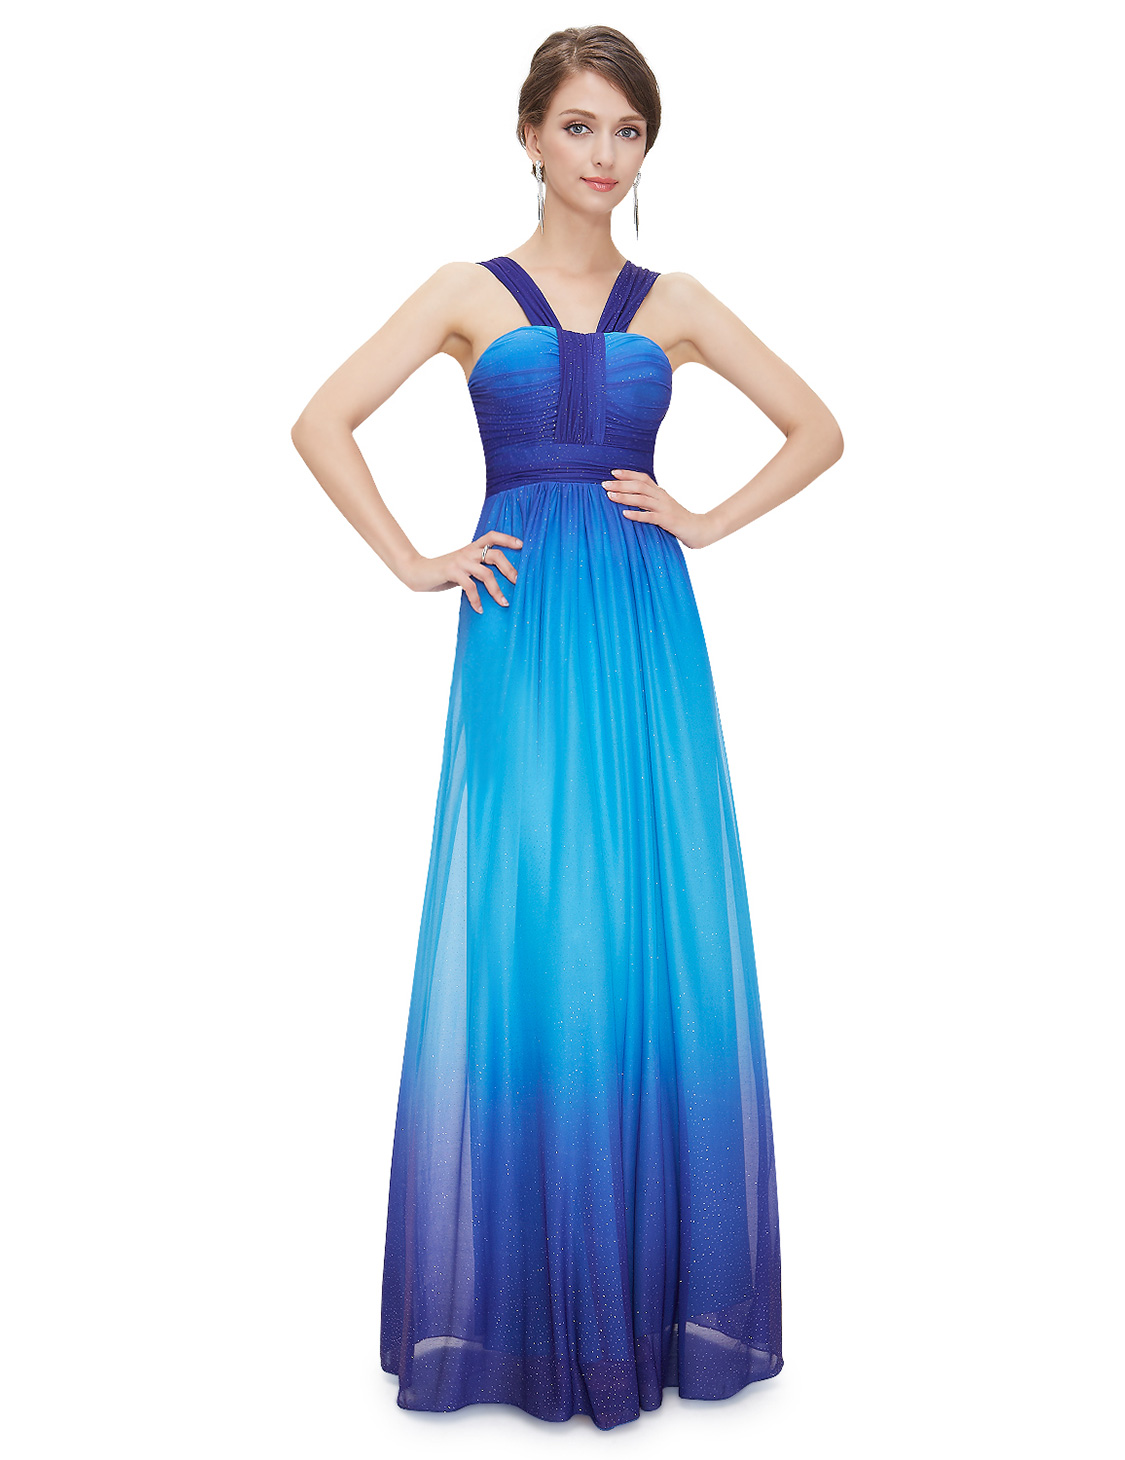 Ebay Party Dresses Size 16 - Cheap Party Dresses